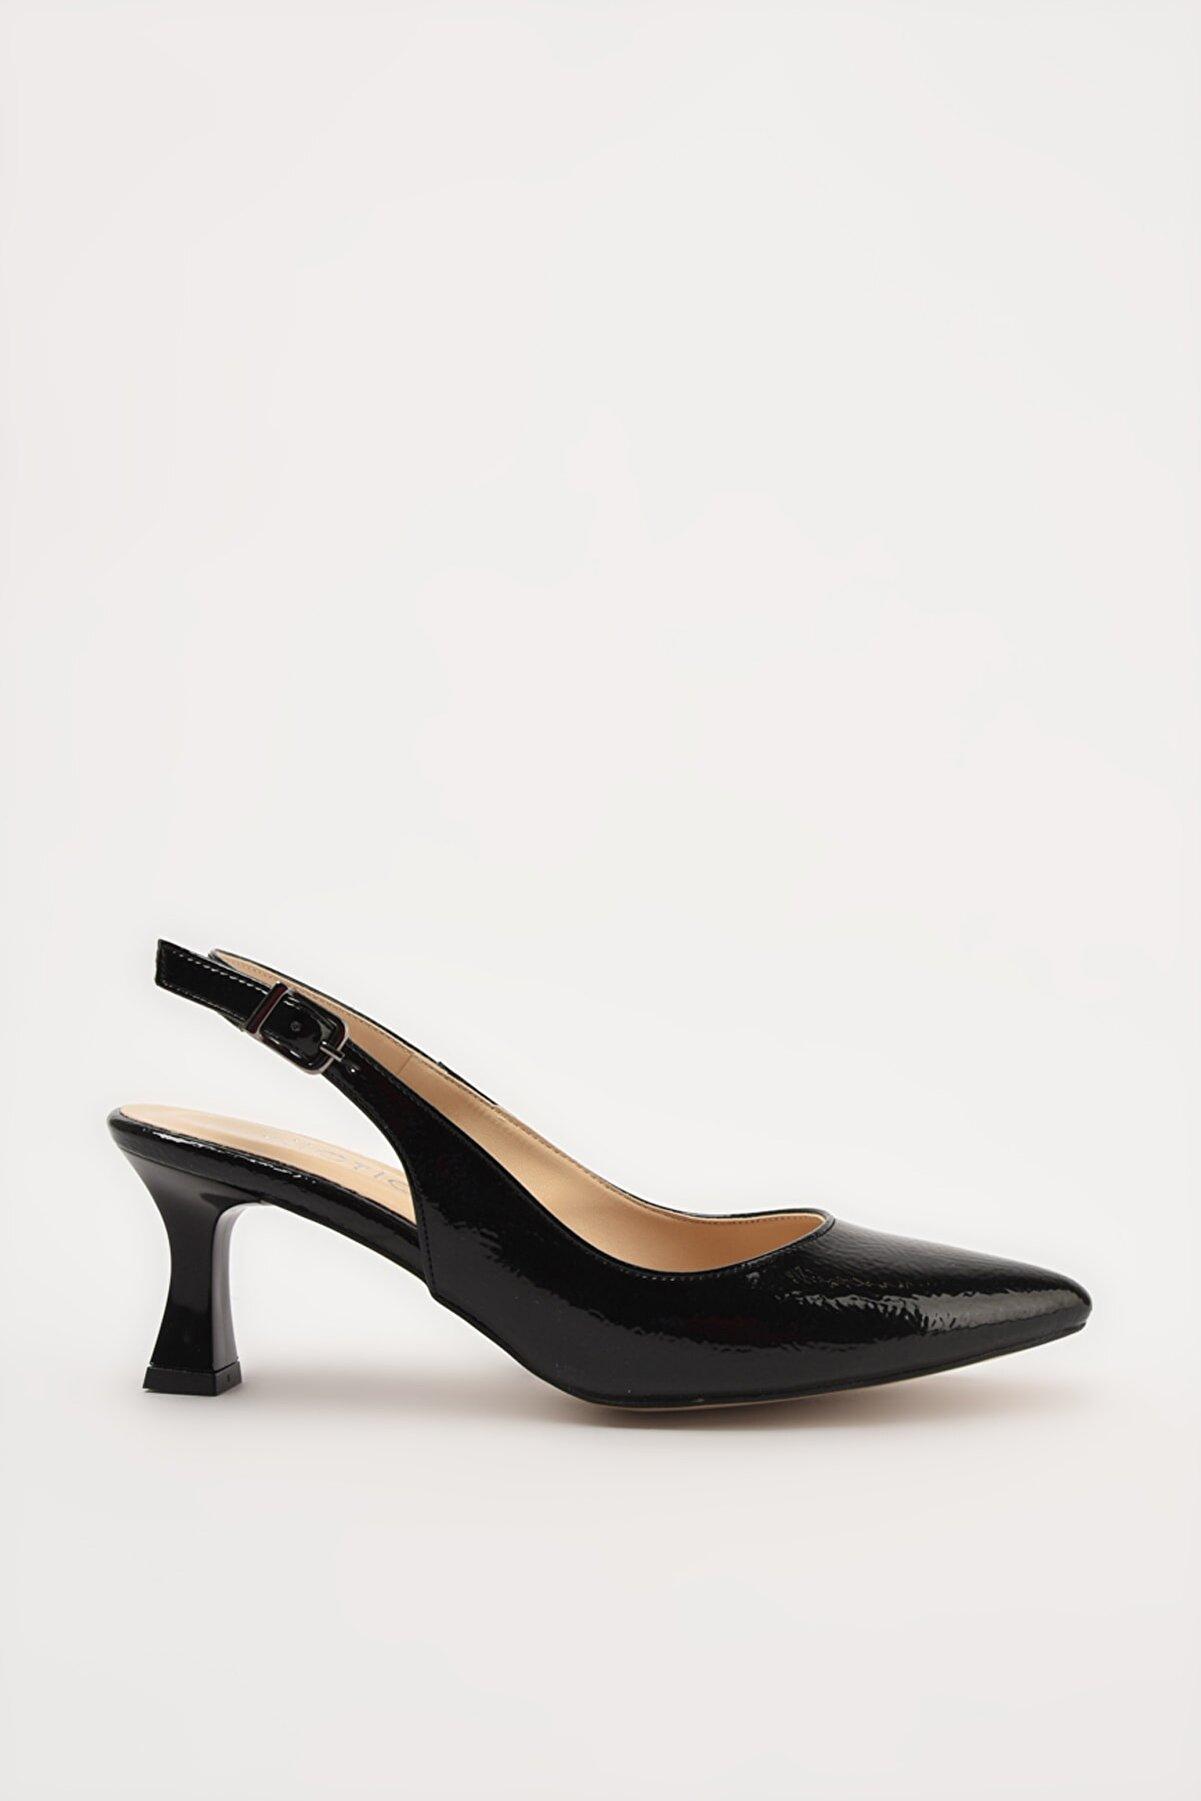 Hotiç Siyah Kadın Klasik Topuklu Ayakkabı 01AYH214440A100